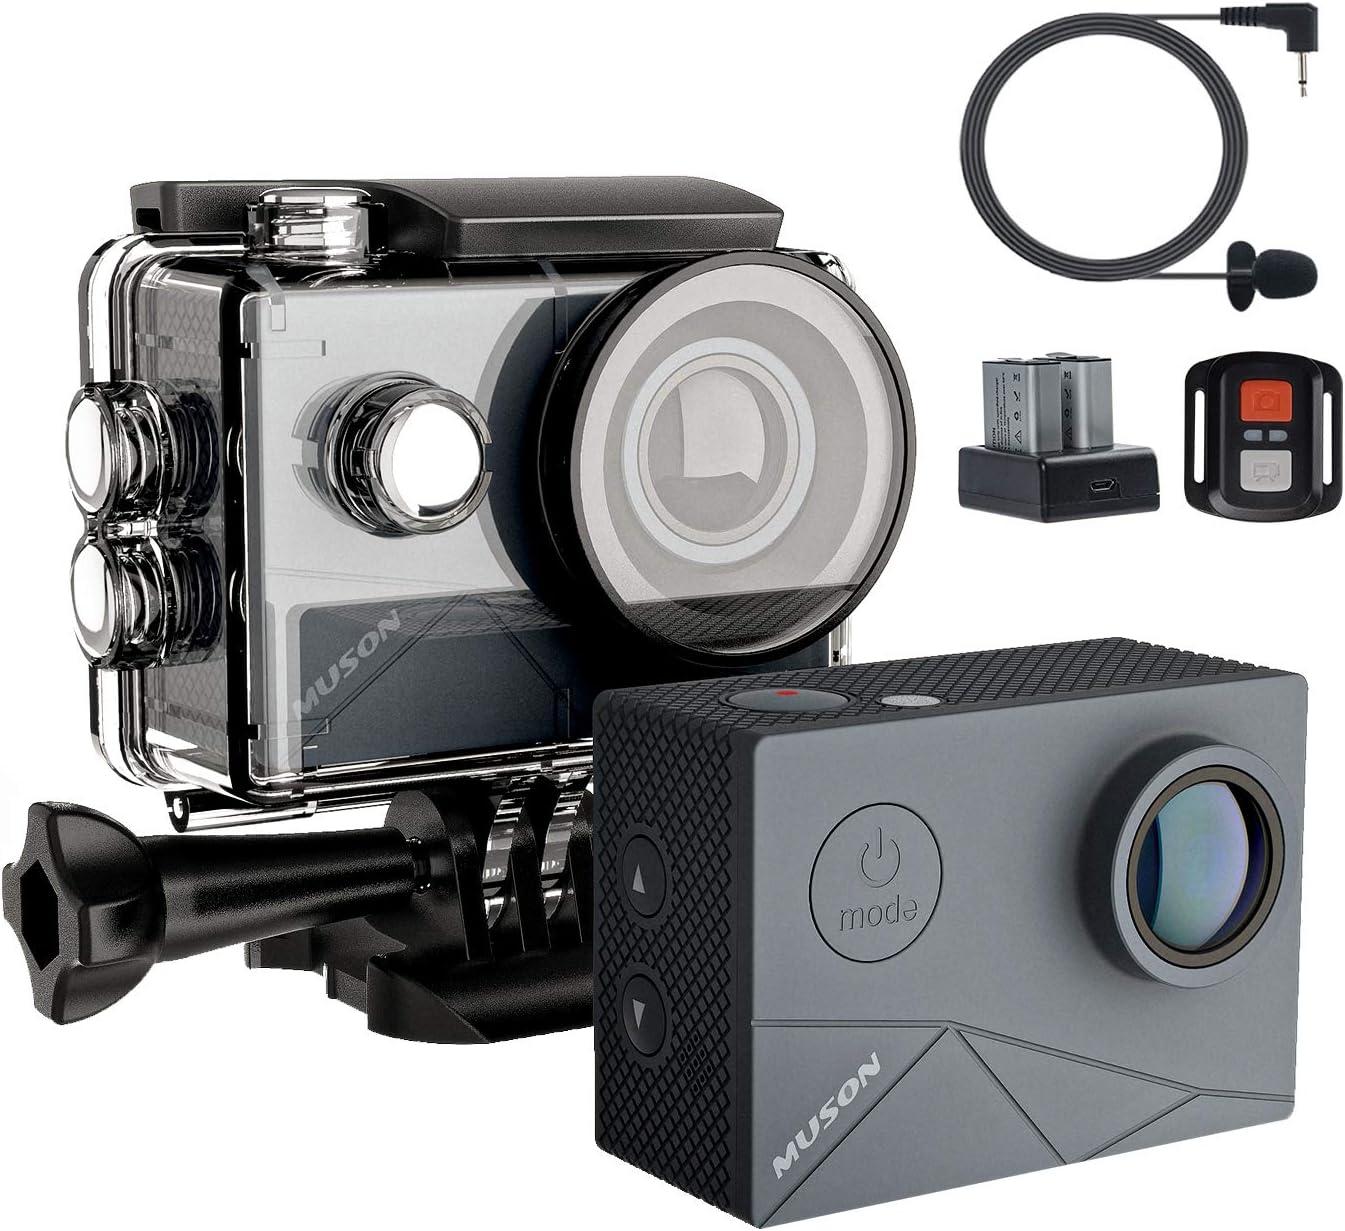 MUSON(ムソン) MAX1 アクションカメラ